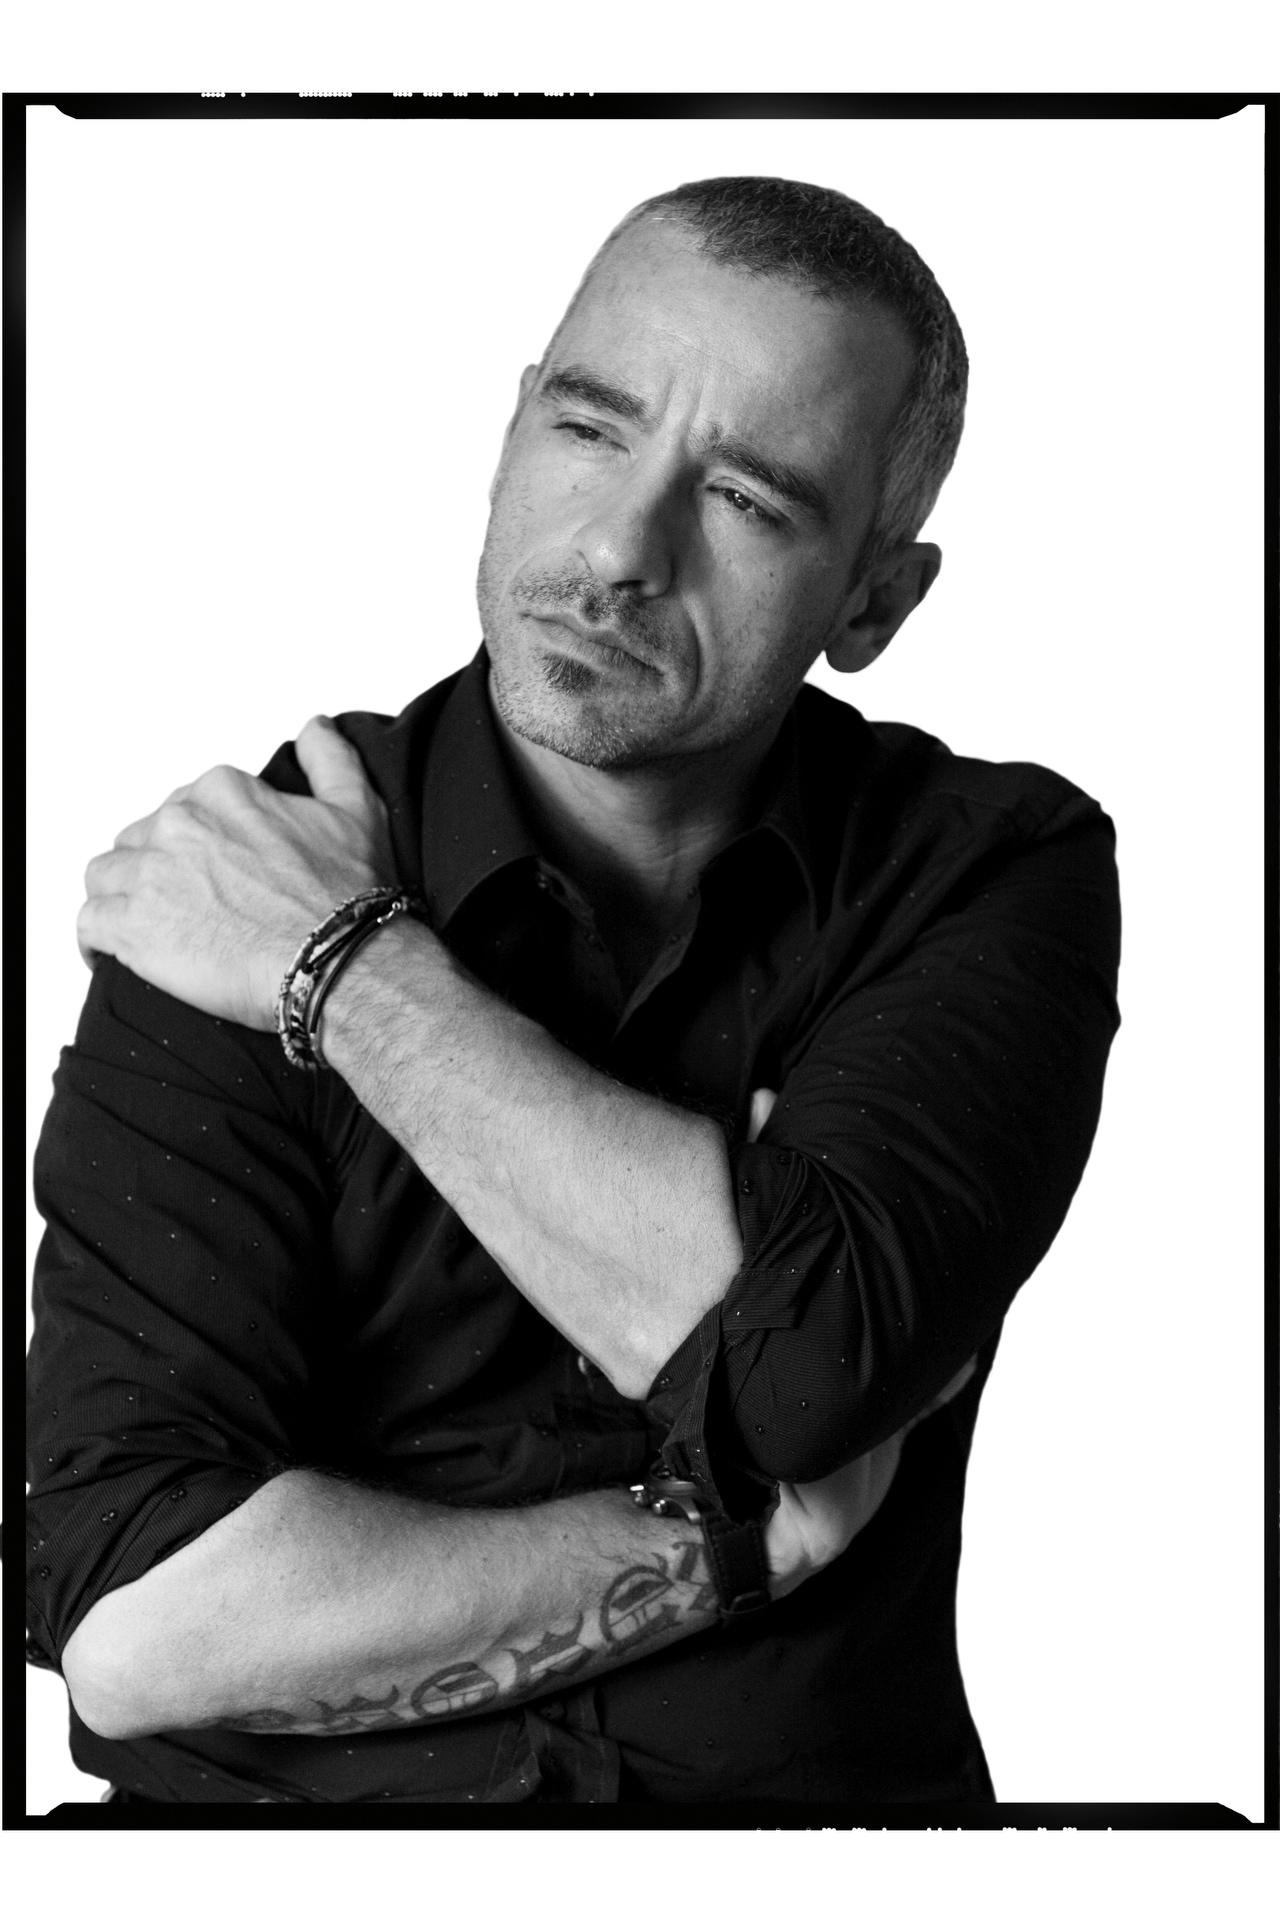 Sydney portrait photographer, personal branding, head shots, corporate photography, pop singer, Eros Ramzzotti